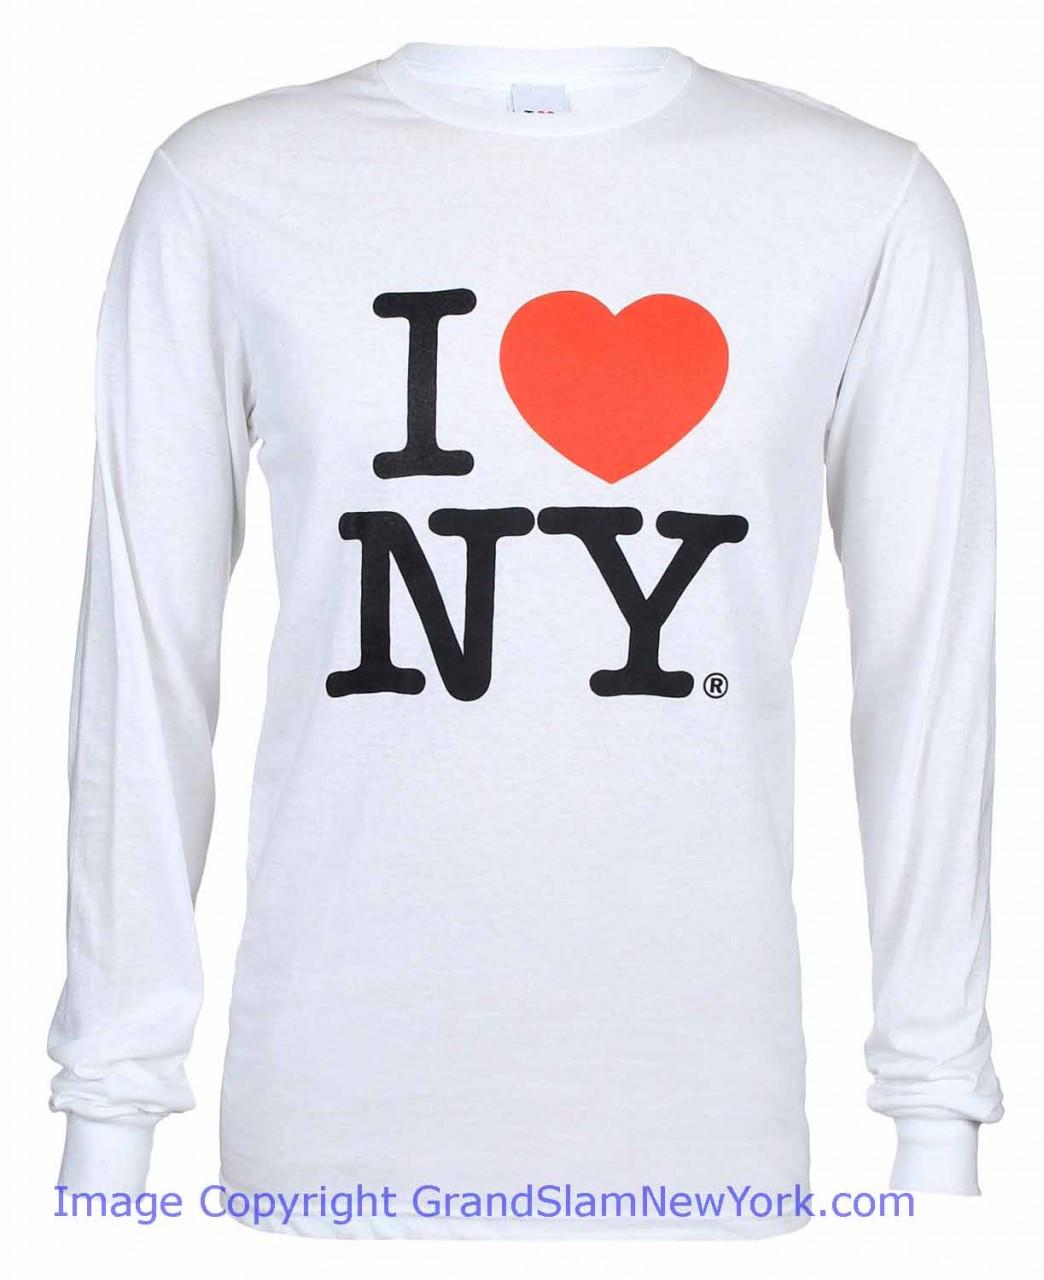 I love ny long sleeve t shirt in white altavistaventures Choice Image